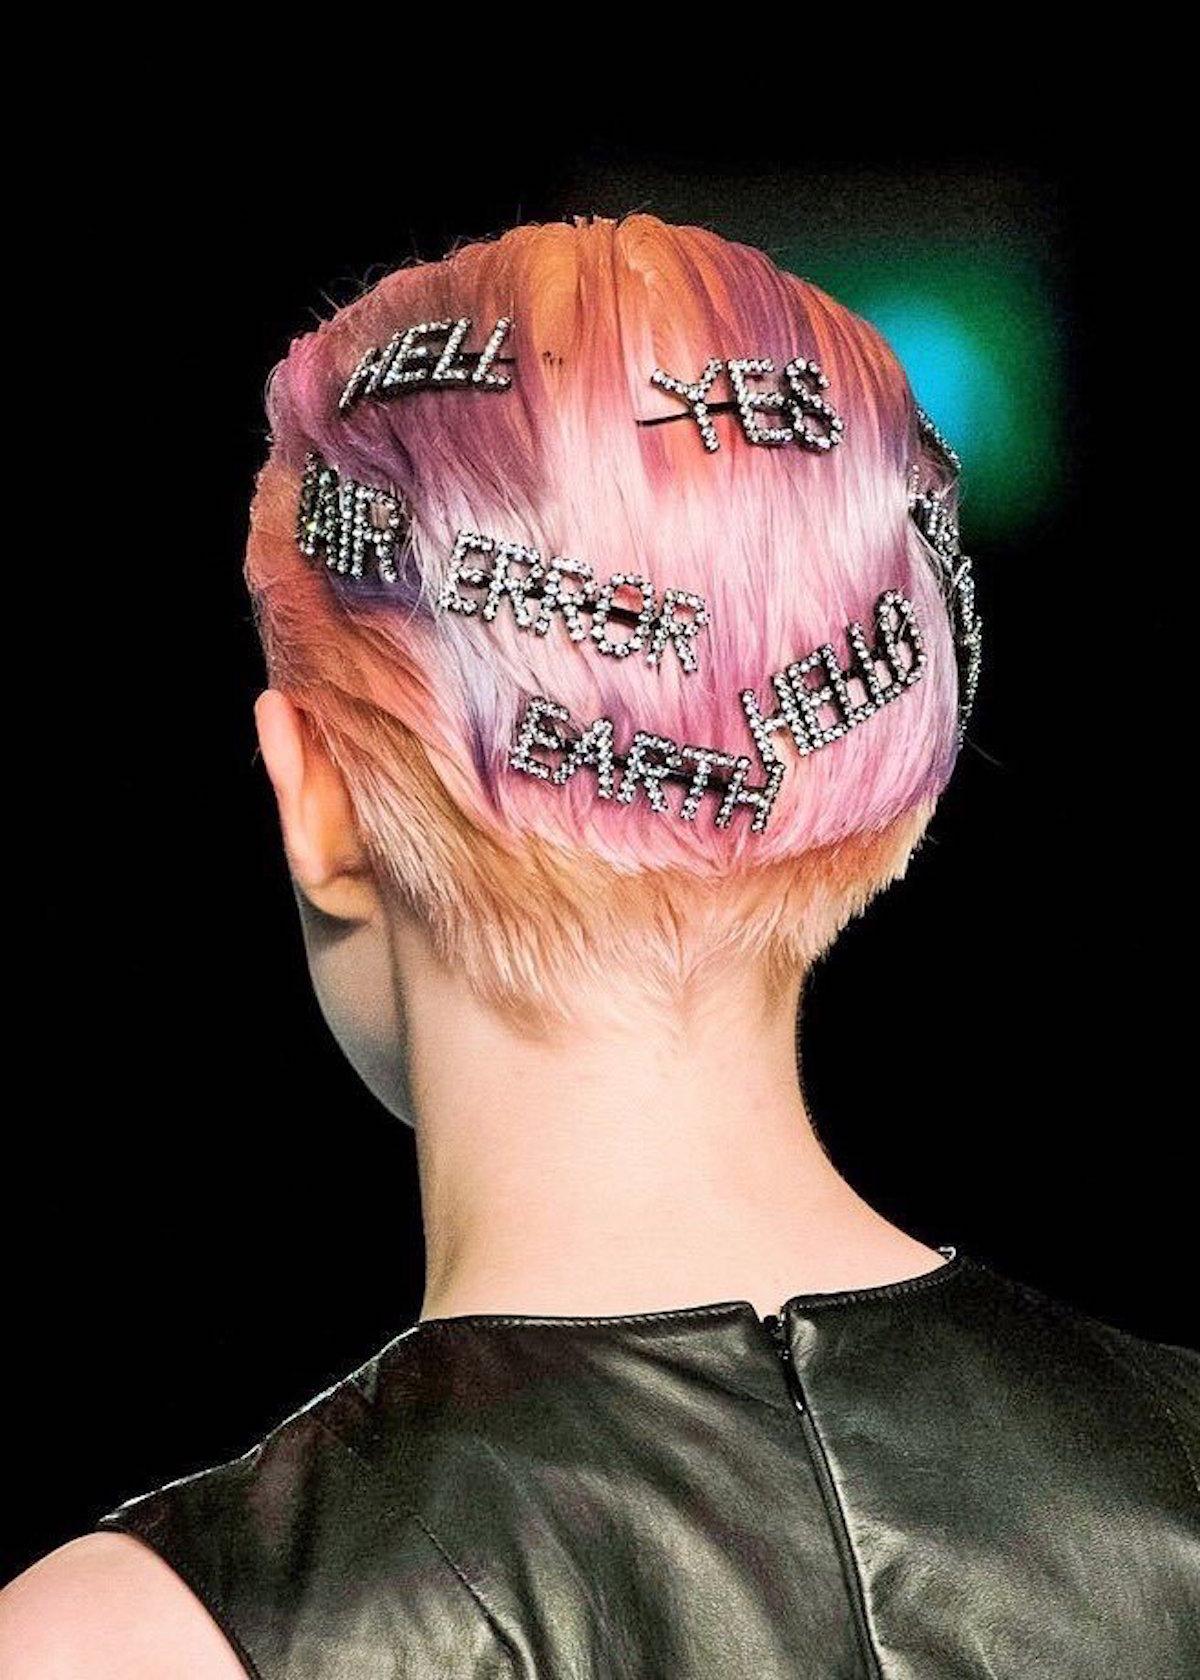 praznicnoa frizura špange z napisi beautyfull blog